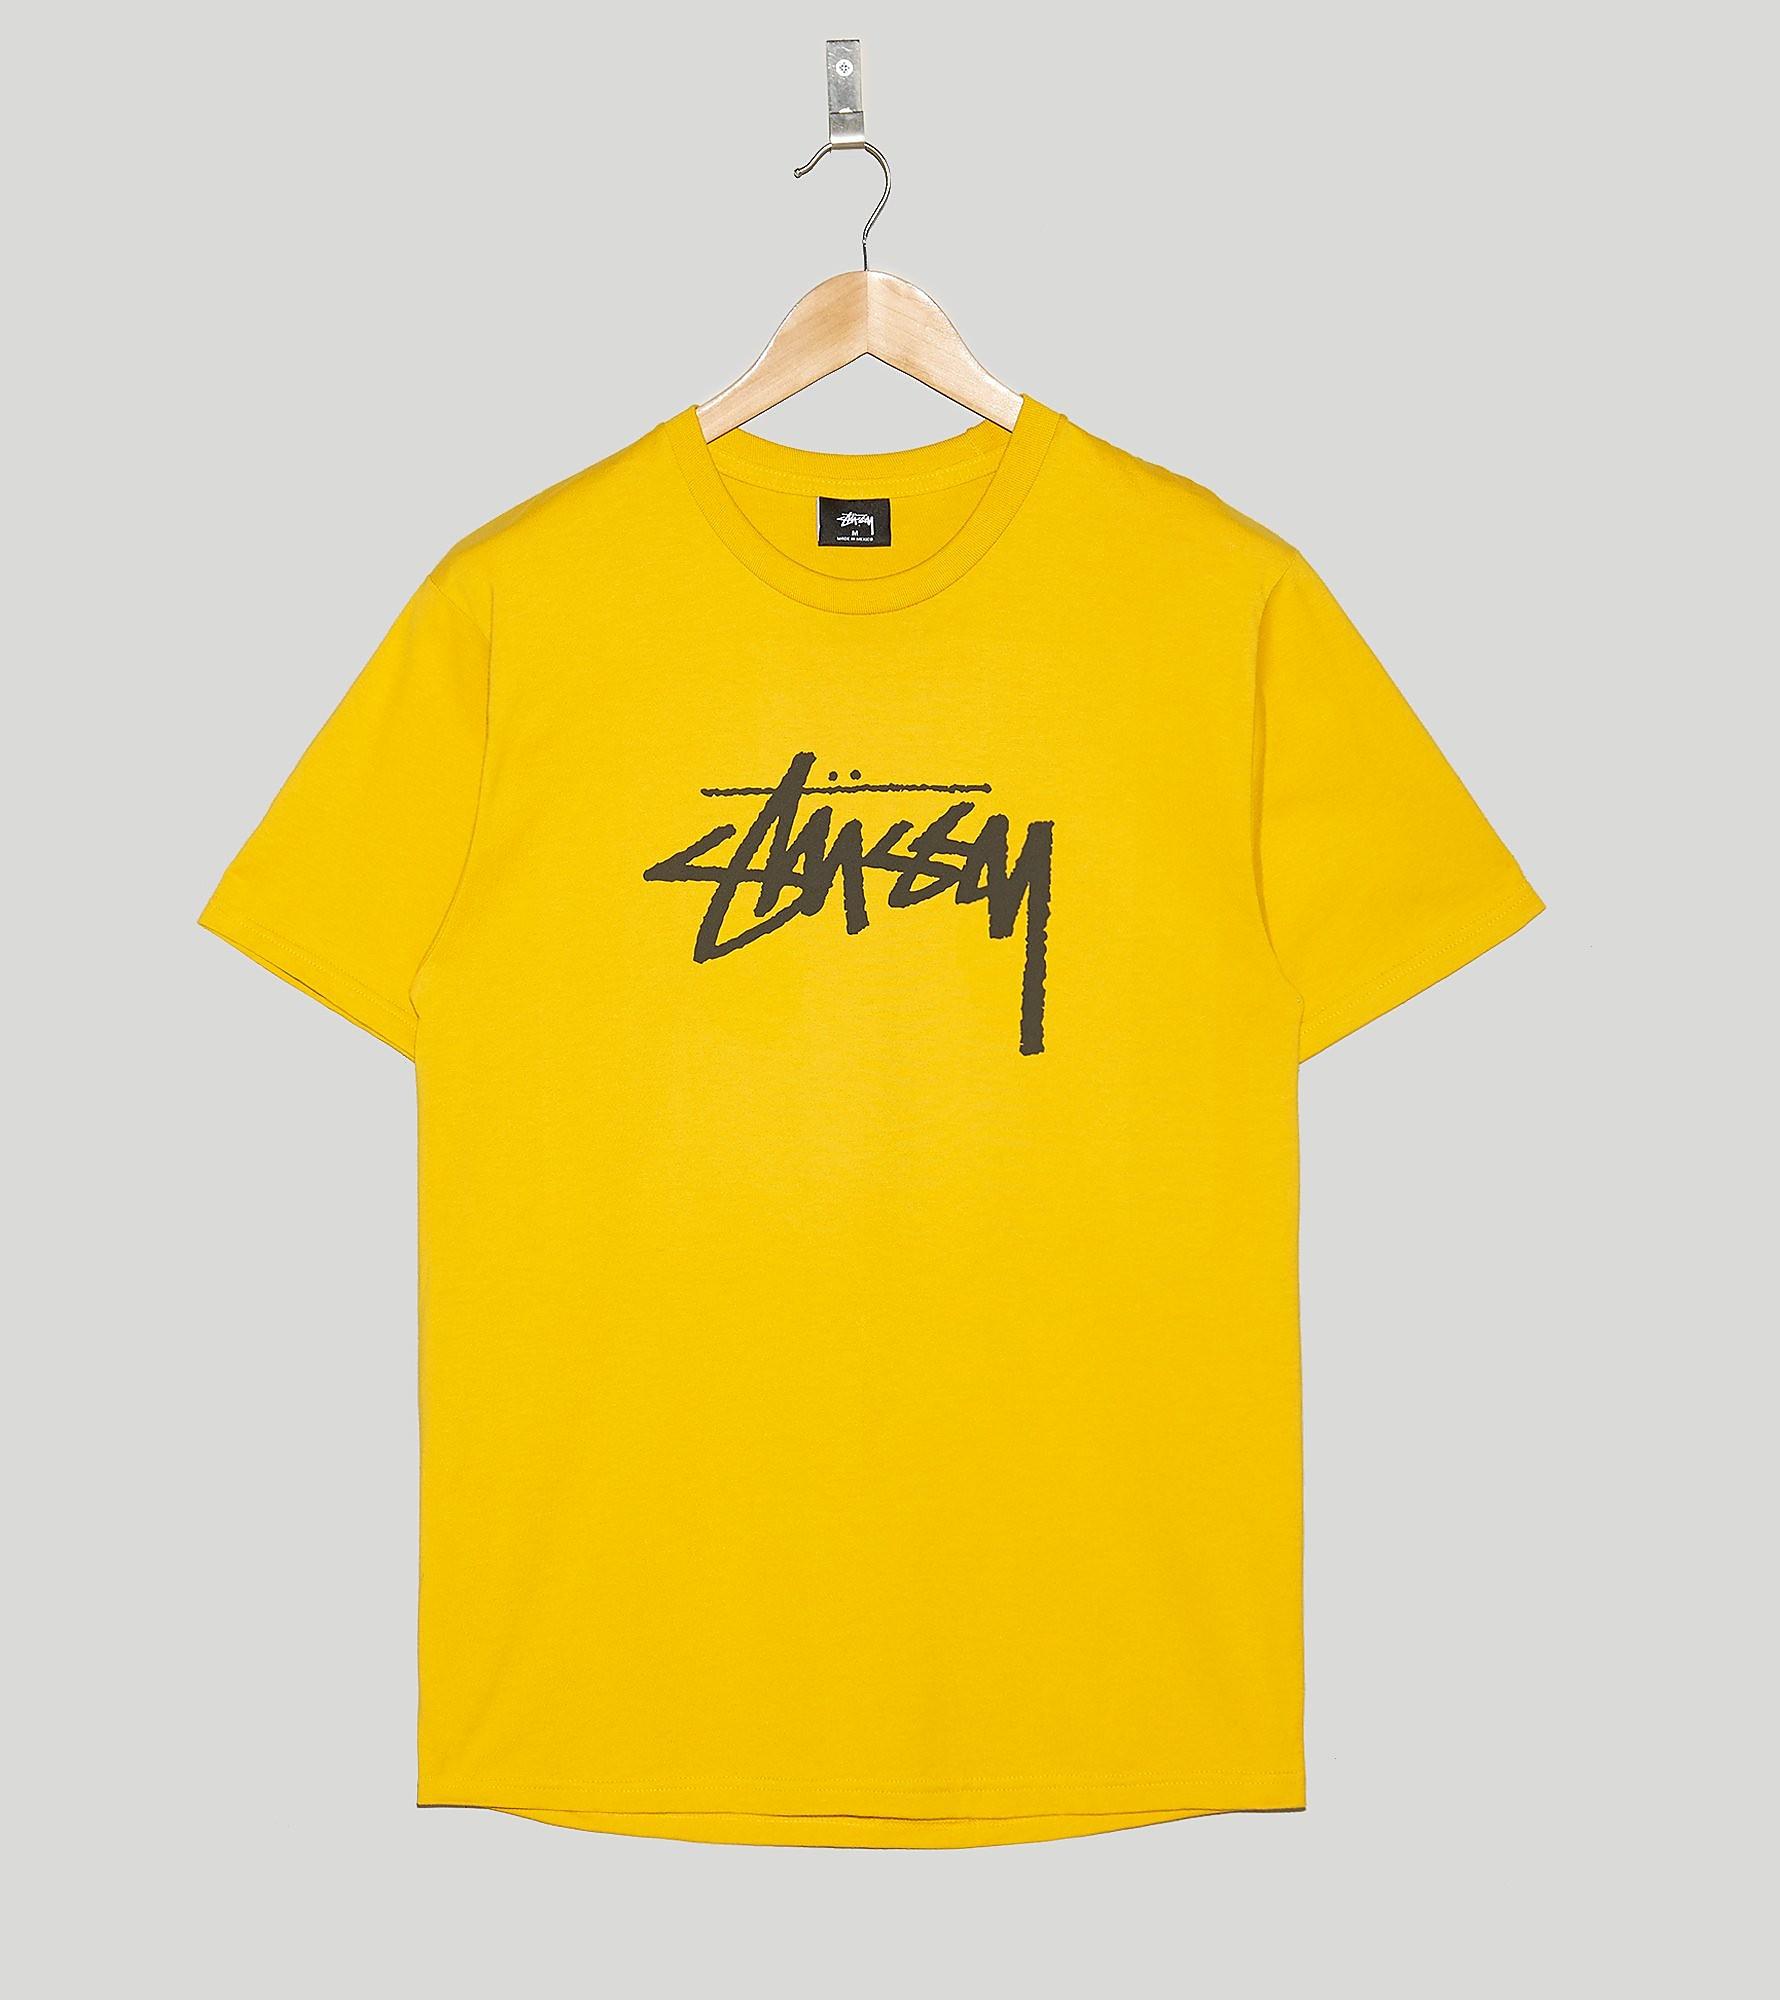 Stussy Stock T-Shirt